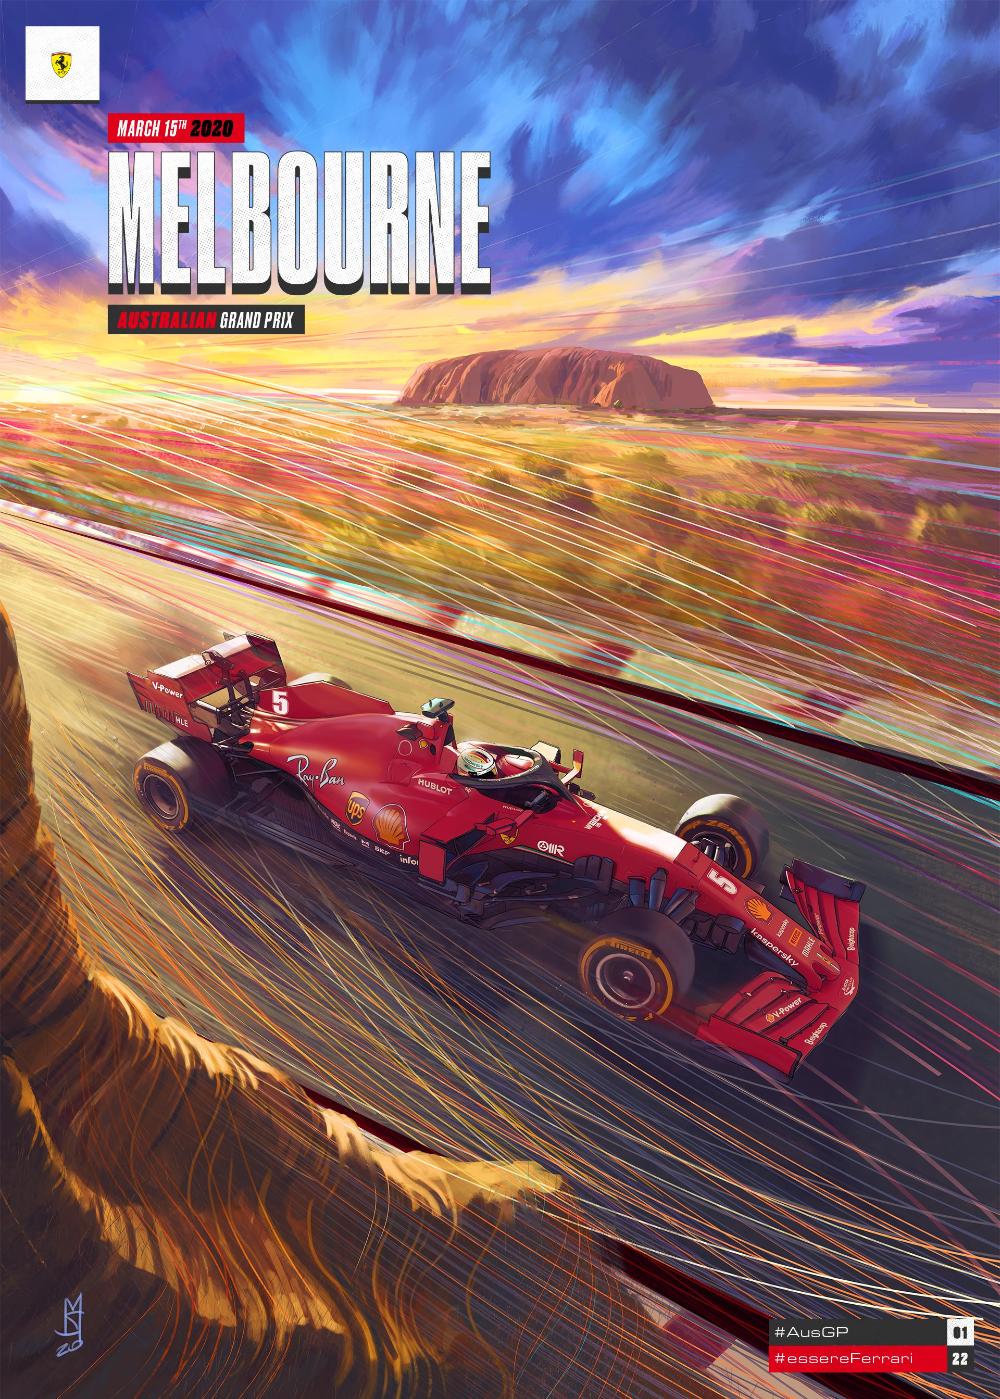 2020. 1. in 2020 Australian grand prix, Melbourne, Grand